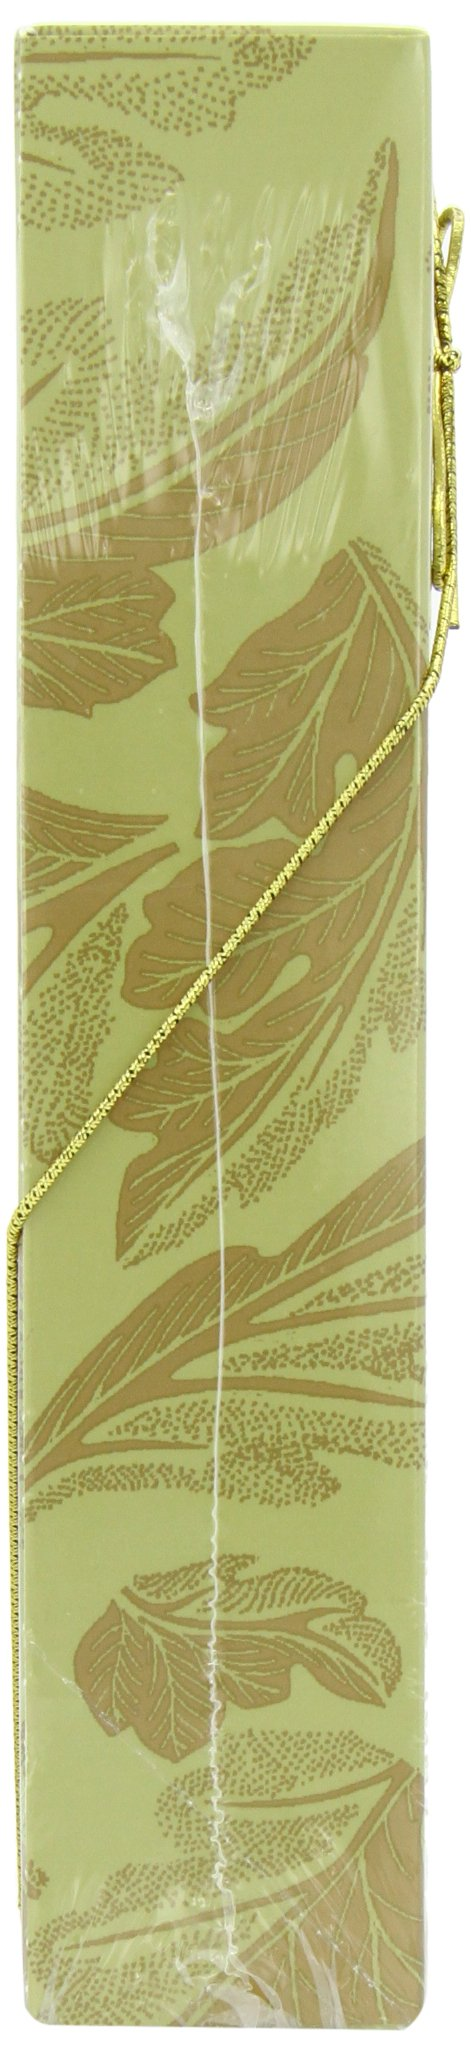 Stash Tea Gold Leaf Nine Flavor Gift Box by Stash Tea (Image #4)